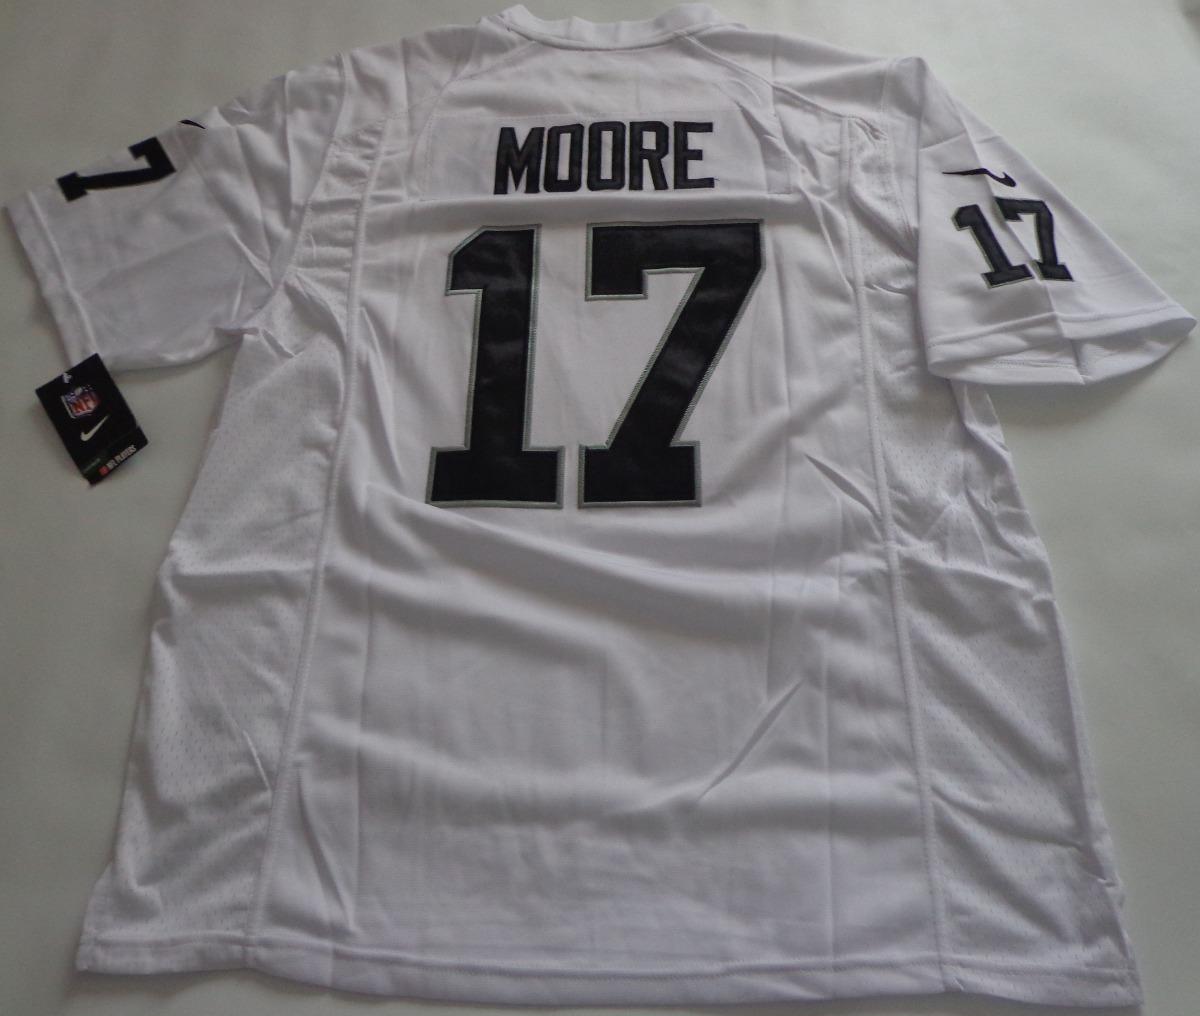 9b92f8c85dafc Oackland Usa Nike Nfl Futbol Americano Camiseta Raiders Xl17 qgTHwS